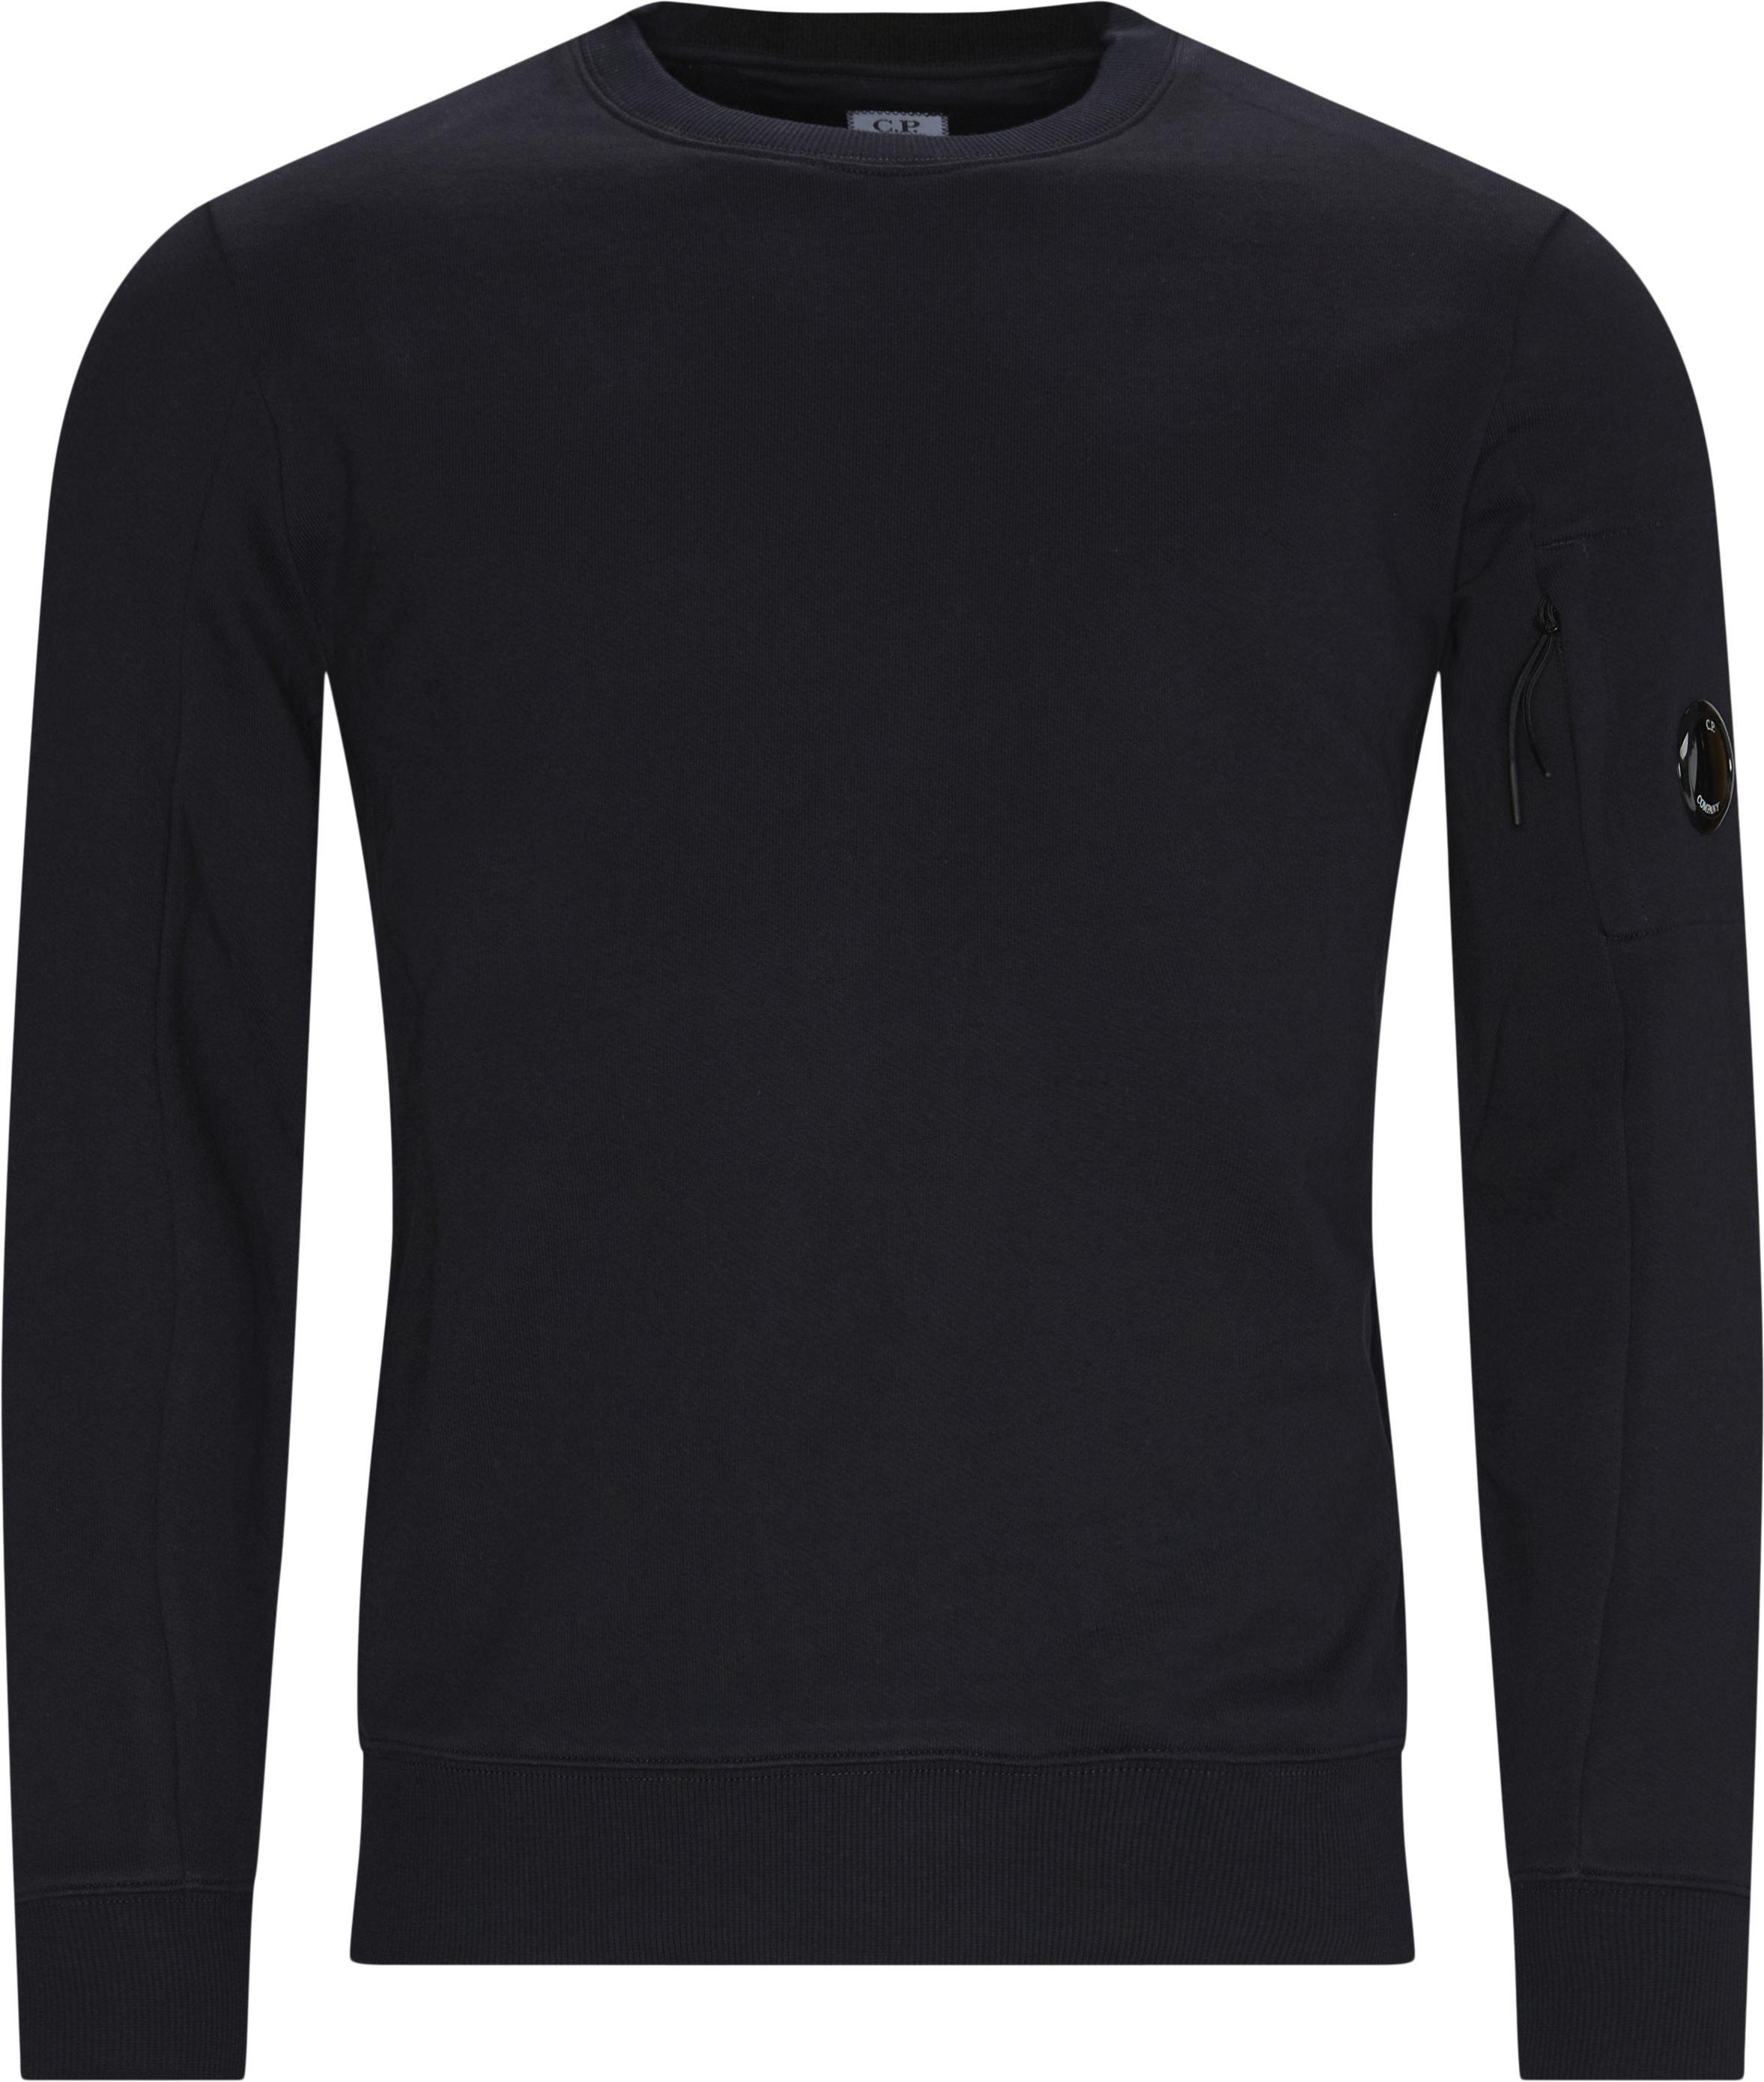 Garment Dyed Light Fleece Lens Crew Sweat - Sweatshirts - Regular fit - Blue